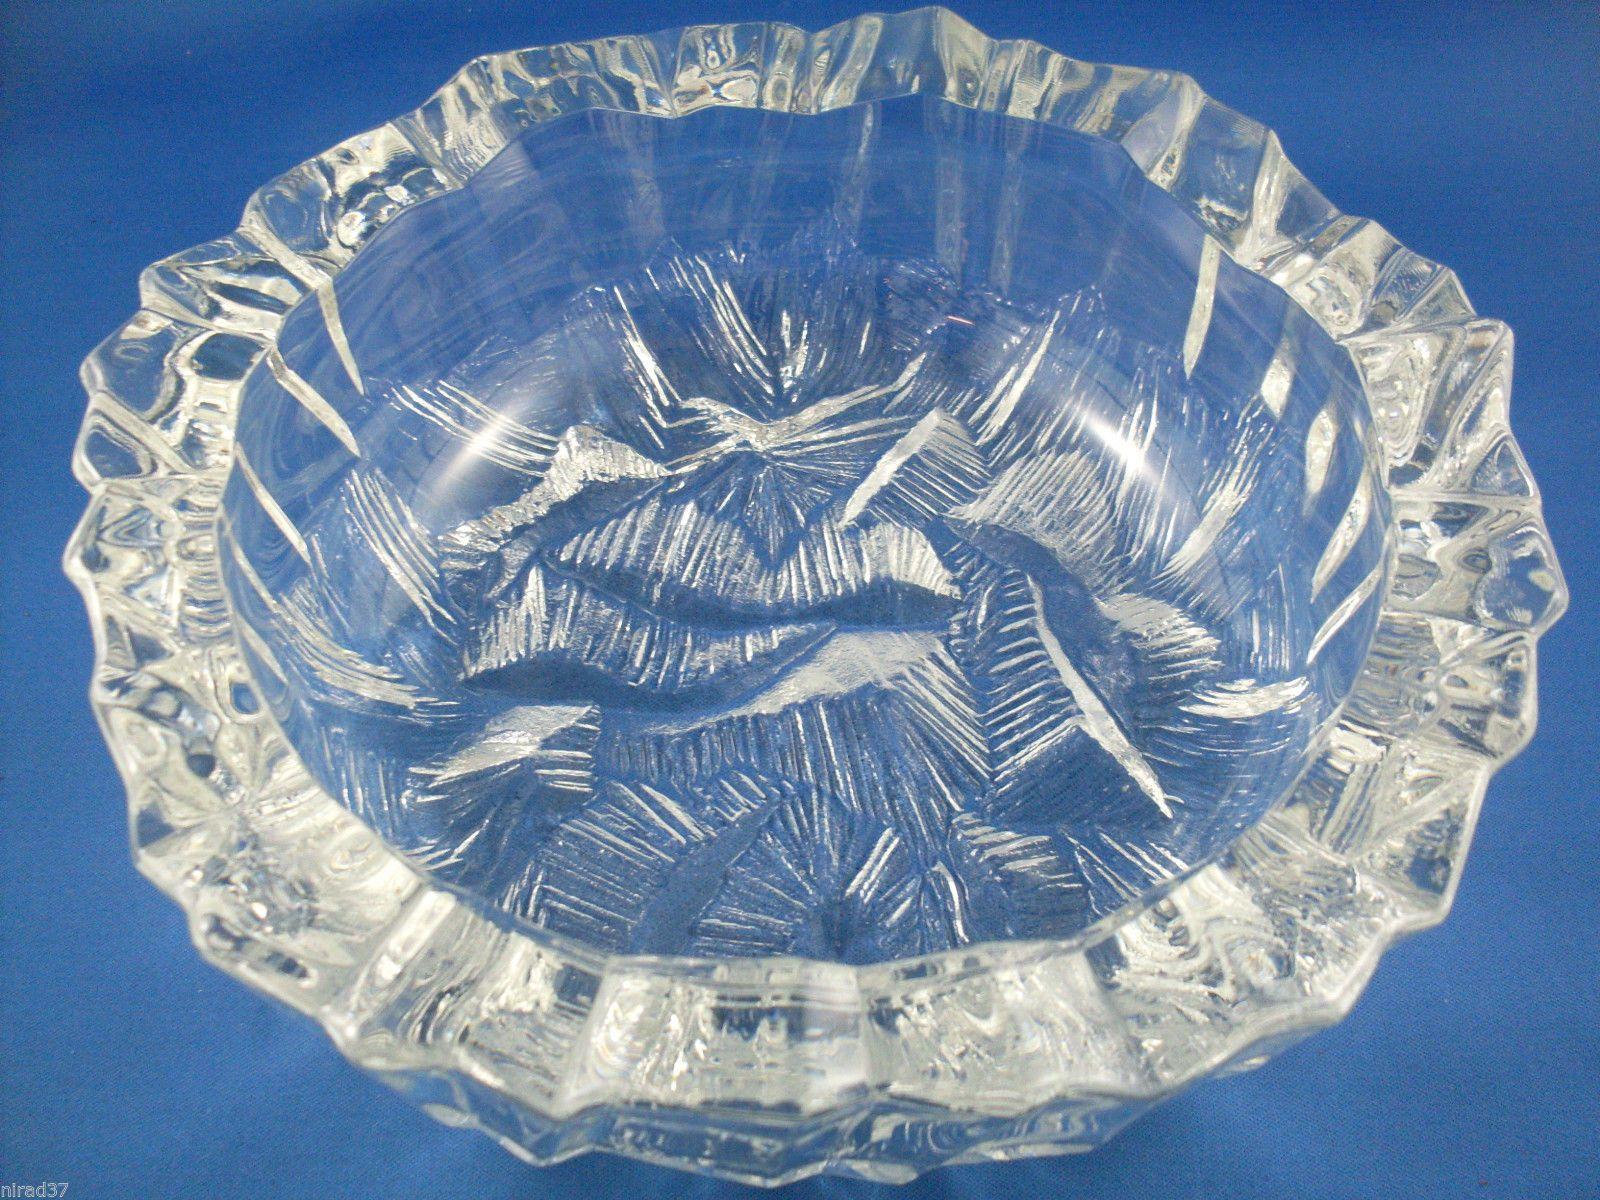 Hoya Japan Crystal Iceberg Bowl 1961 19cm Vintage Glass Pinterest Japan Bowls And Crystals